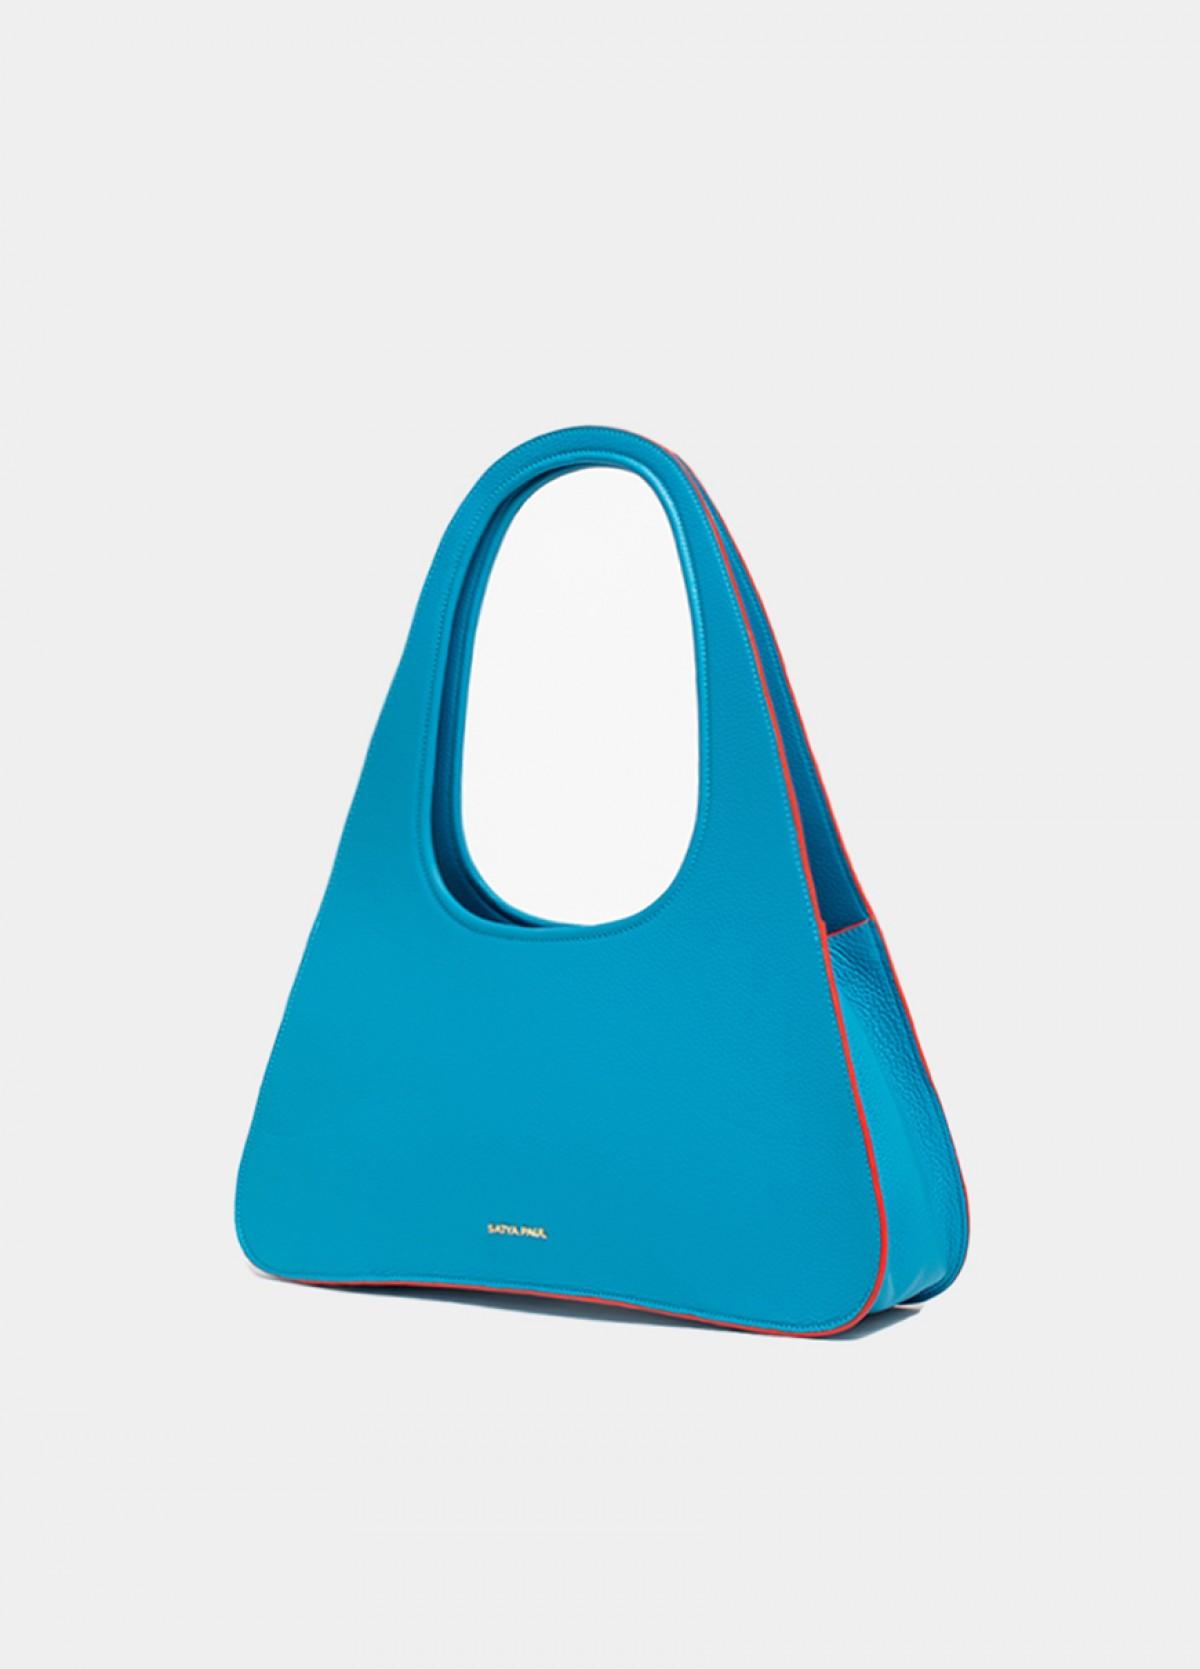 The Meru Leather Handbag